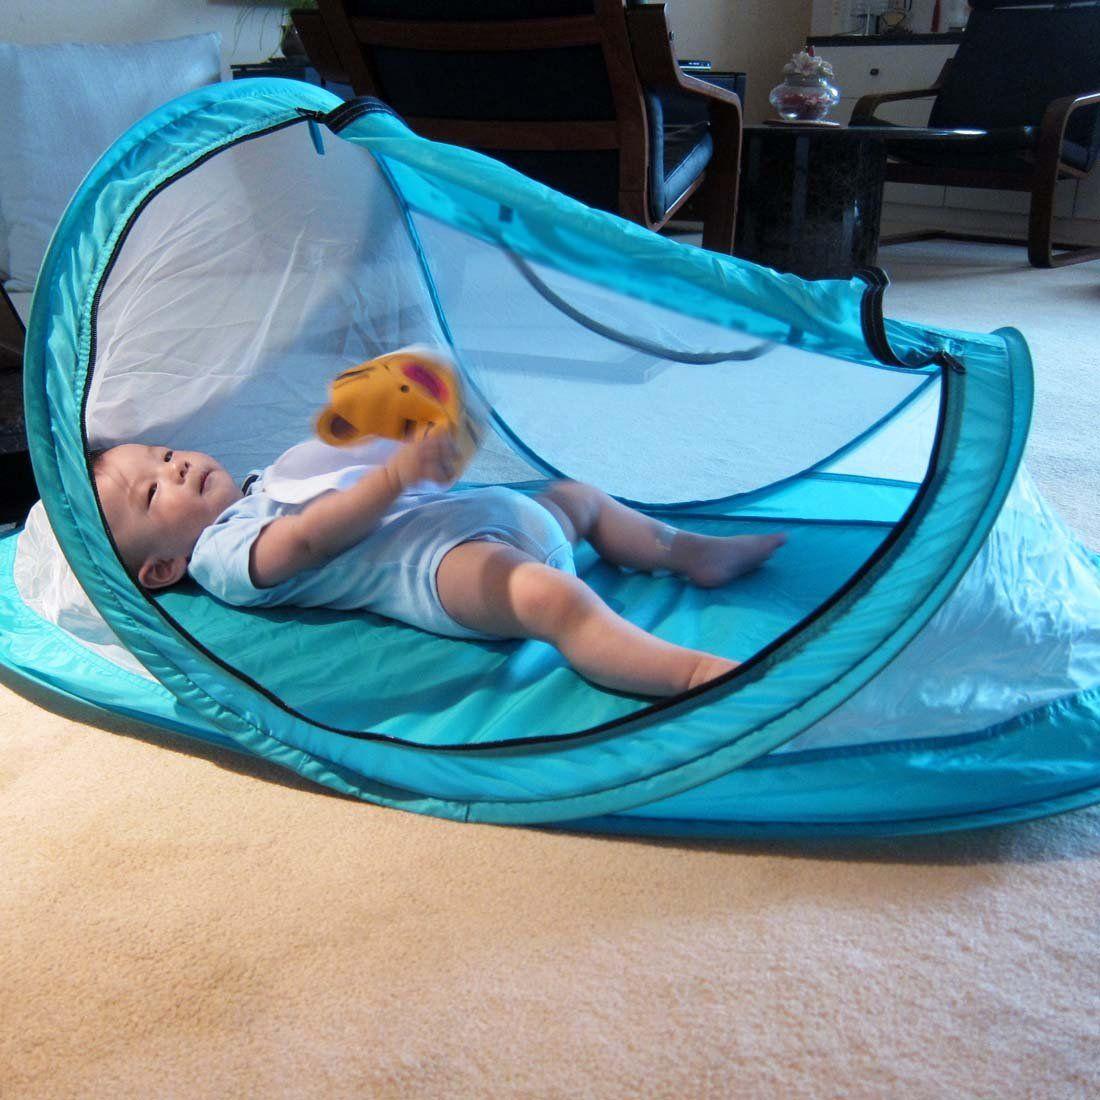 Amazon.com  kilofly Instant Portable Pop Up Travel Baby Beach Tent  Infant And & Amazon.com : kilofly Instant Portable Pop Up Travel Baby Beach ...